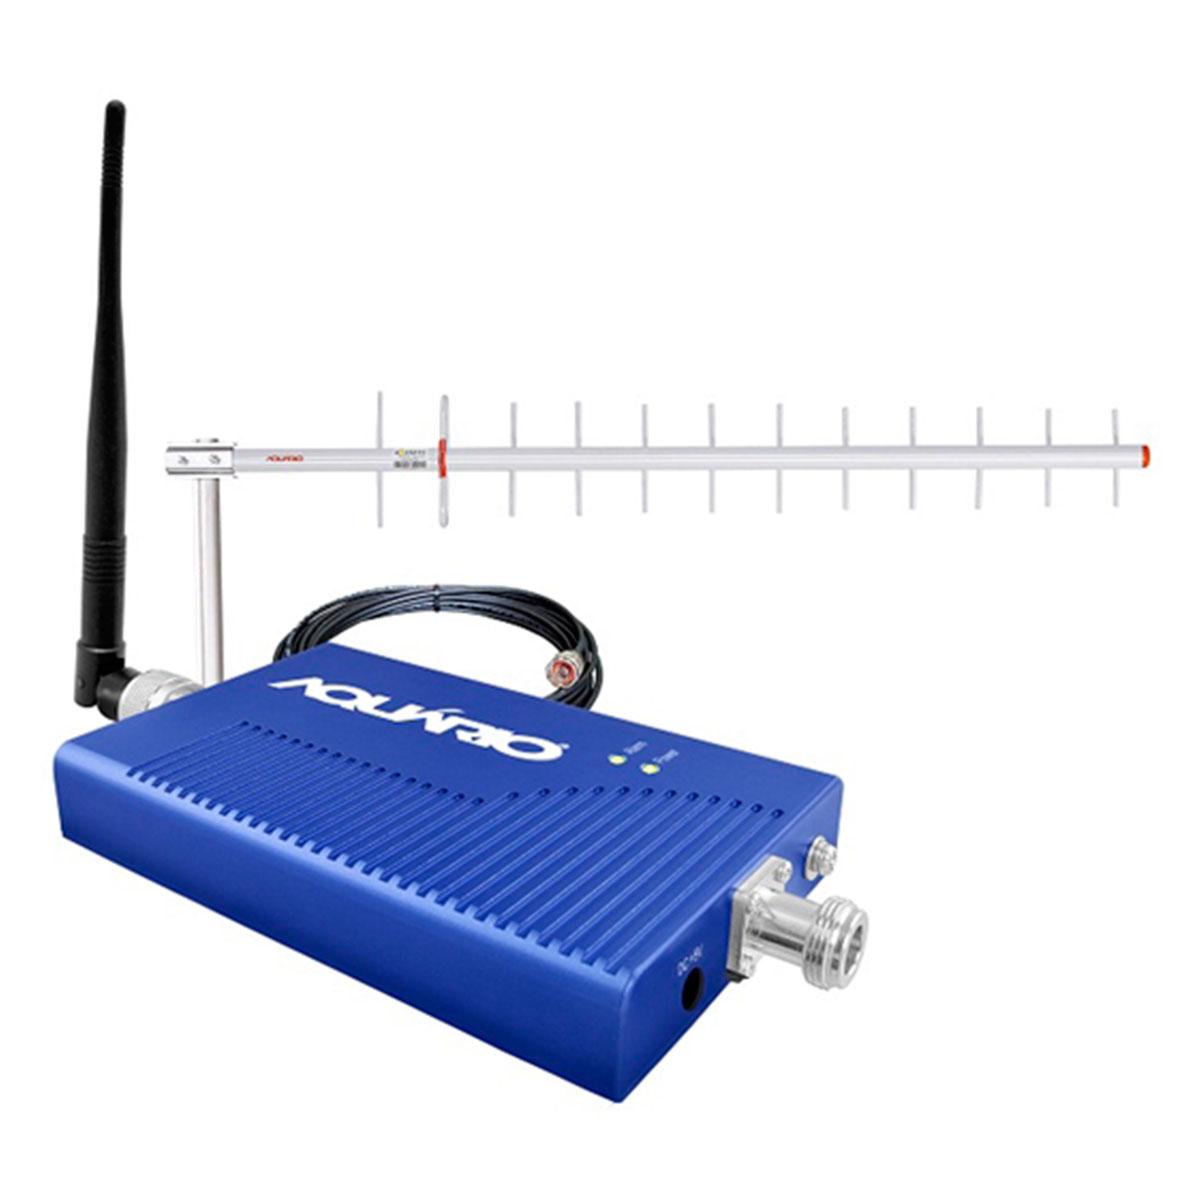 RP 860 N - Mini Repetidor Celular 800MHz p/ Nextel RP860N Aquário